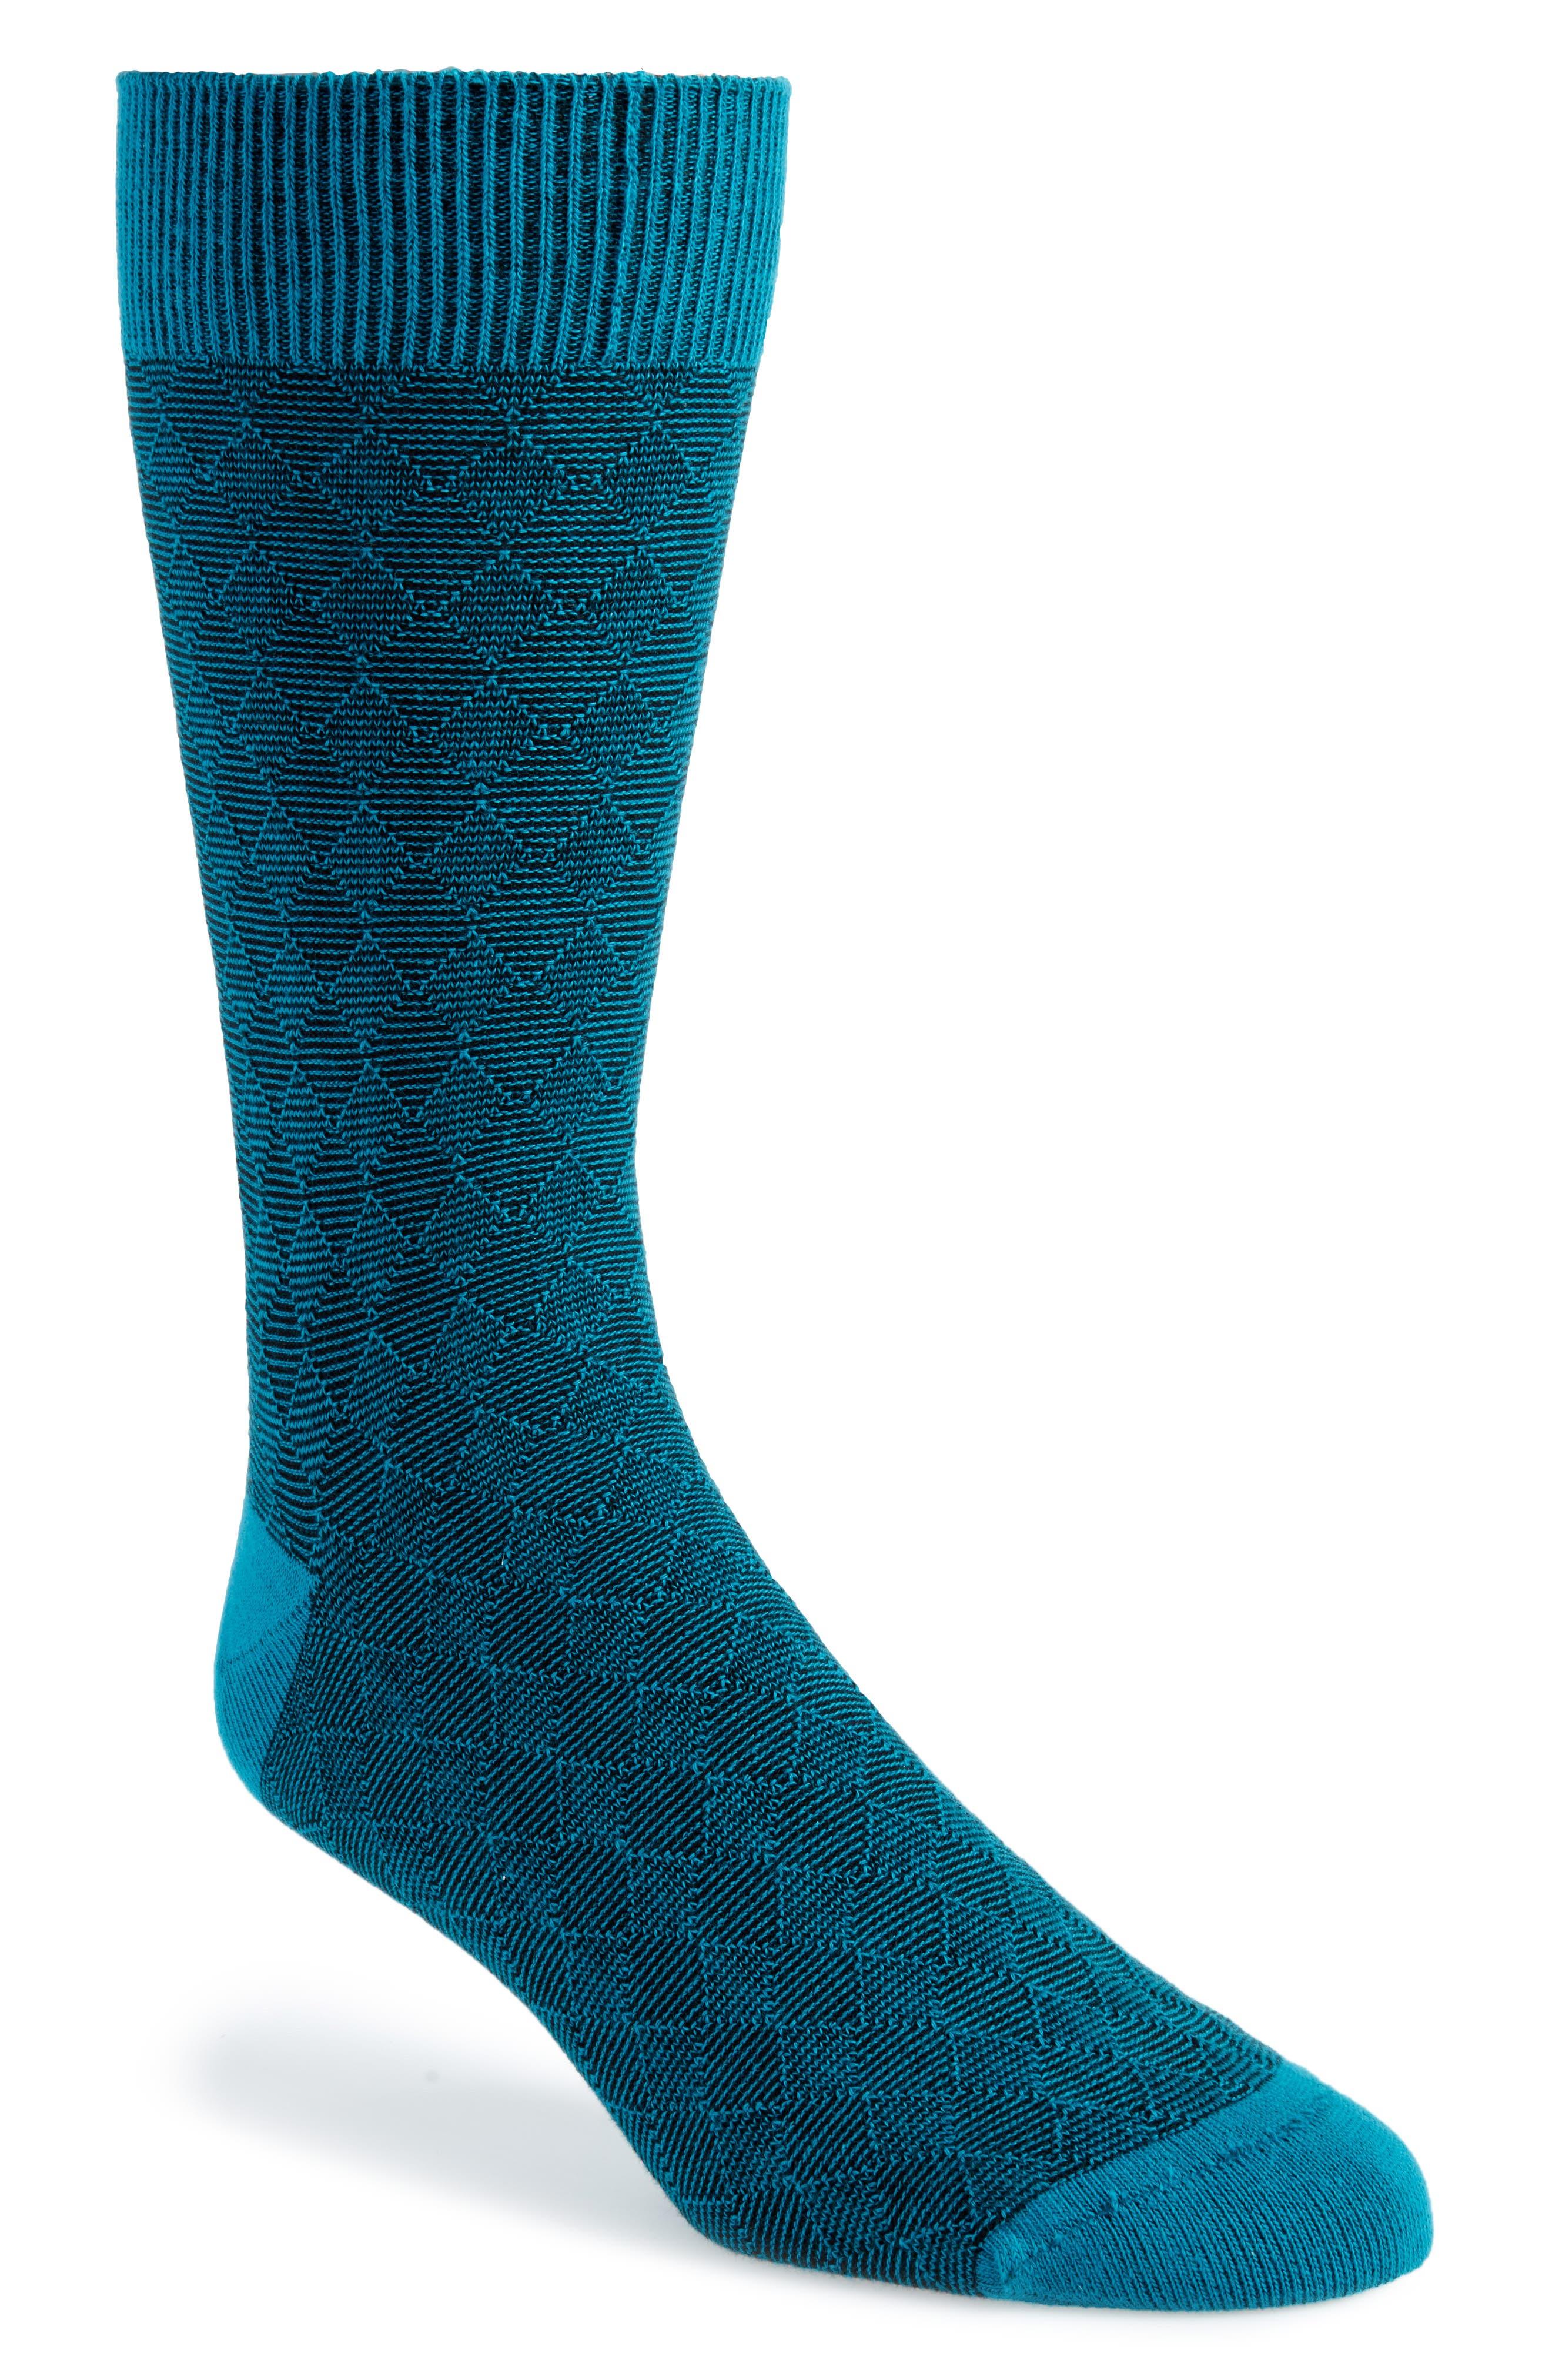 Diamond Textured Socks,                         Main,                         color, Teal